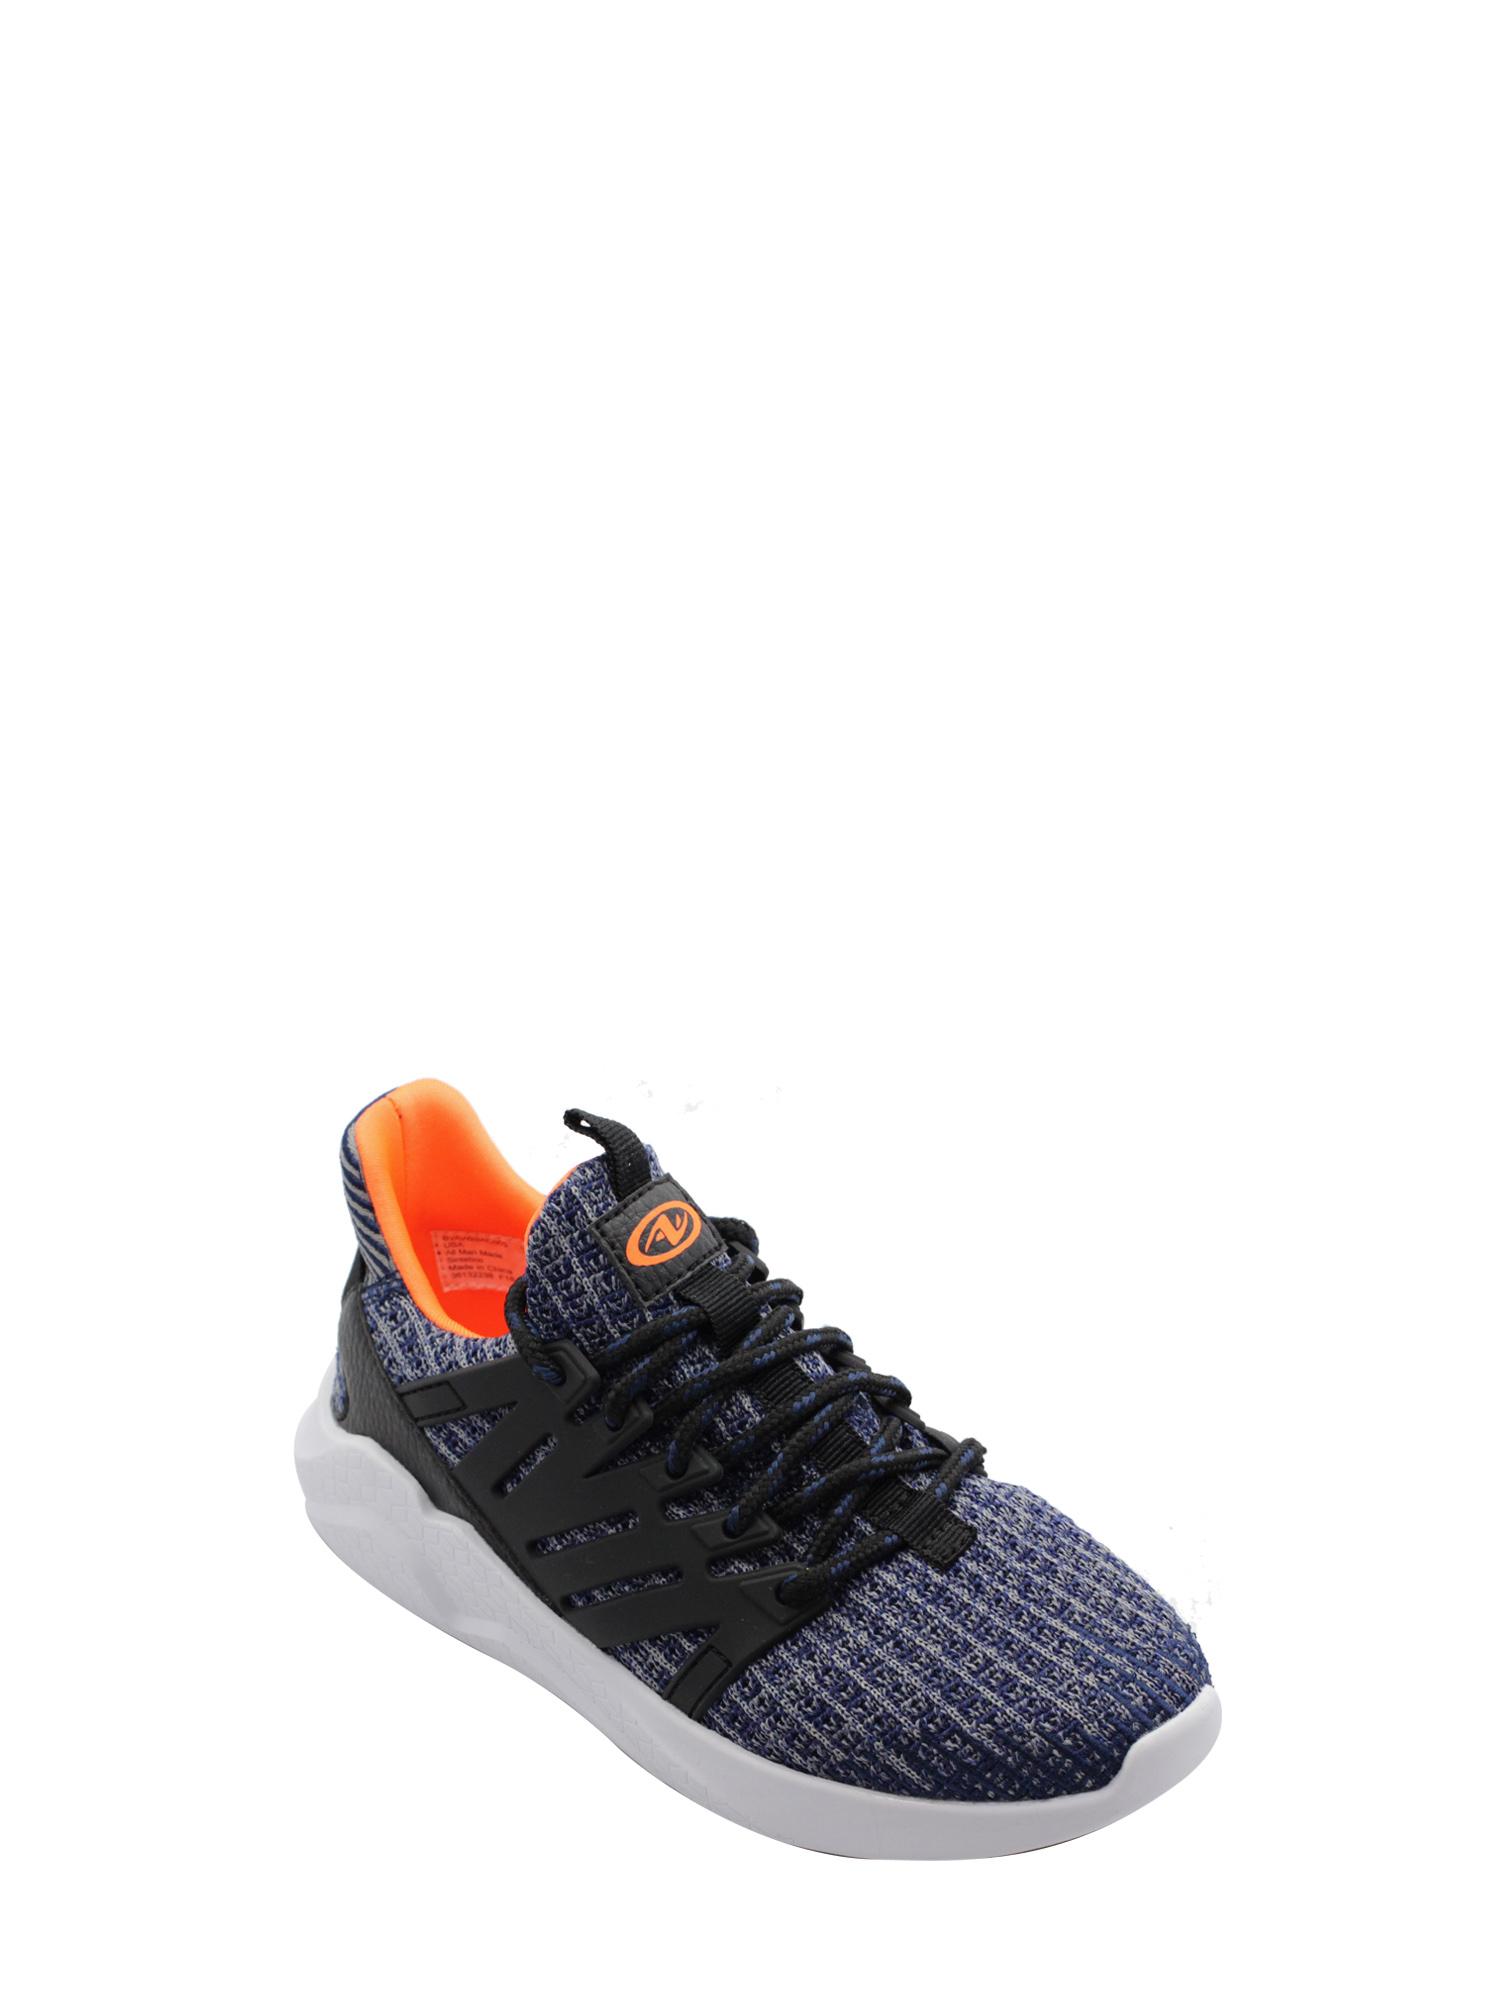 Boys' Athletic Works Knit Athletic Shoe